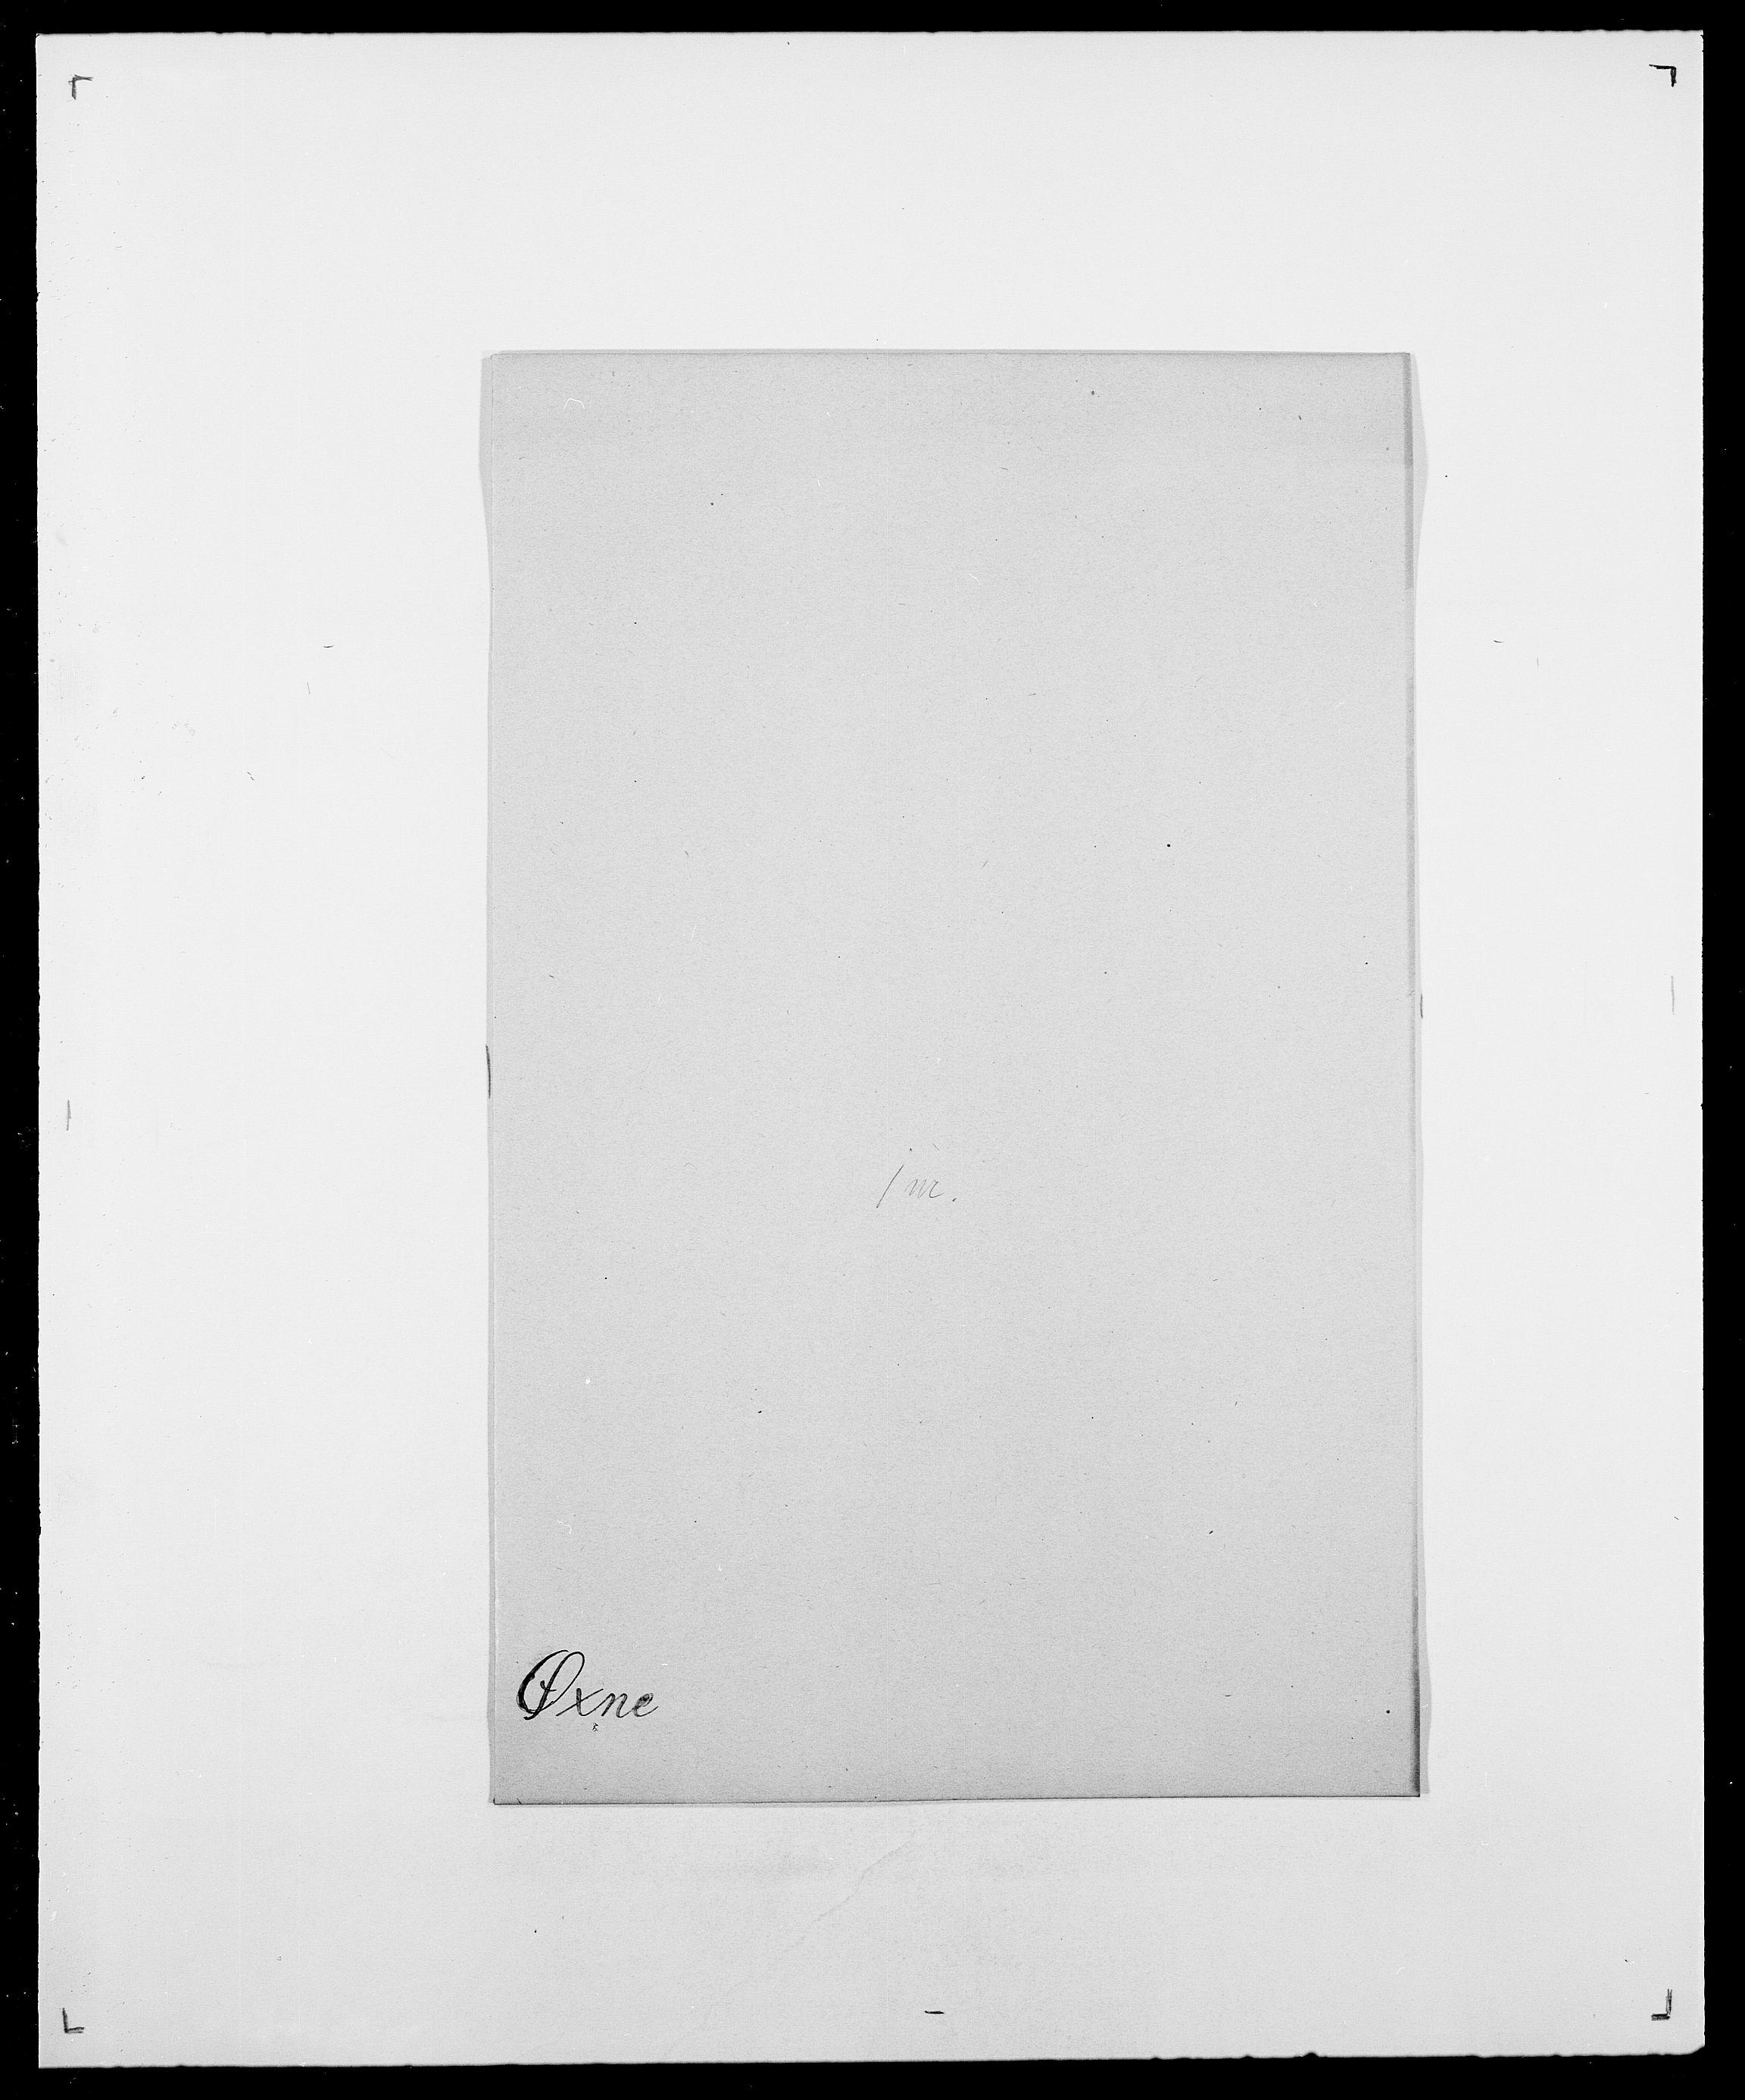 SAO, Delgobe, Charles Antoine - samling, D/Da/L0043: Wulfsberg - v. Zanten, s. 422